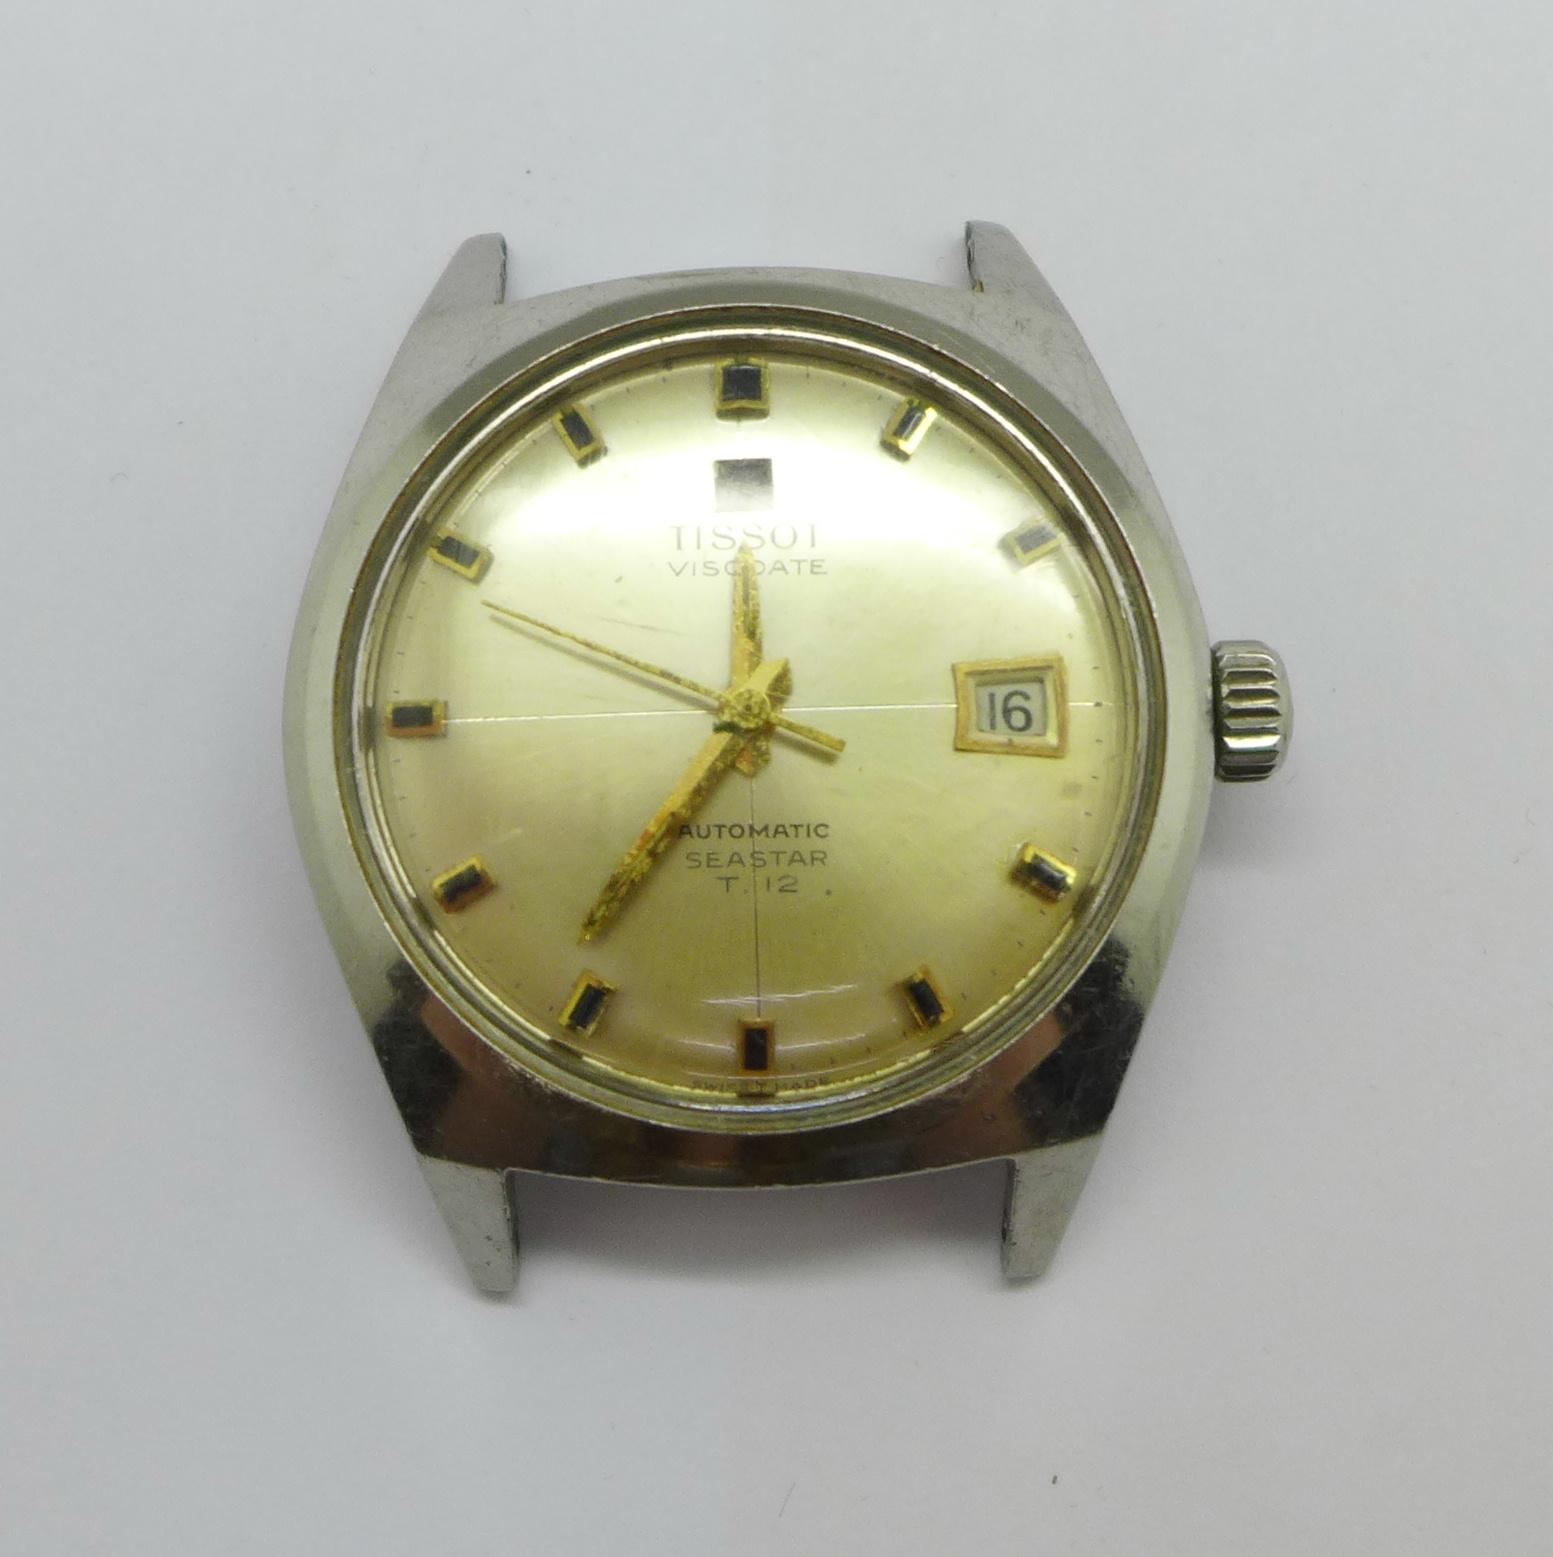 A Tissot Visodate Seastear T12 automatic wristwatch - Image 6 of 6